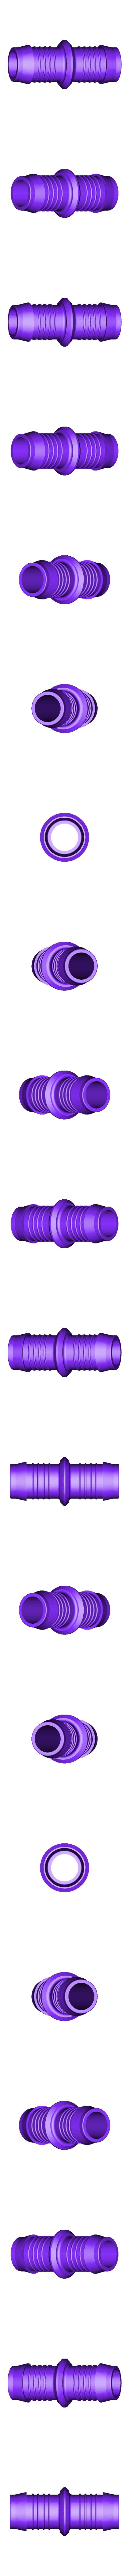 Connecteur Gardena 20mm.stl Download free STL file Connector for Gardena 20mm pipes • 3D print design, PHIL-IP